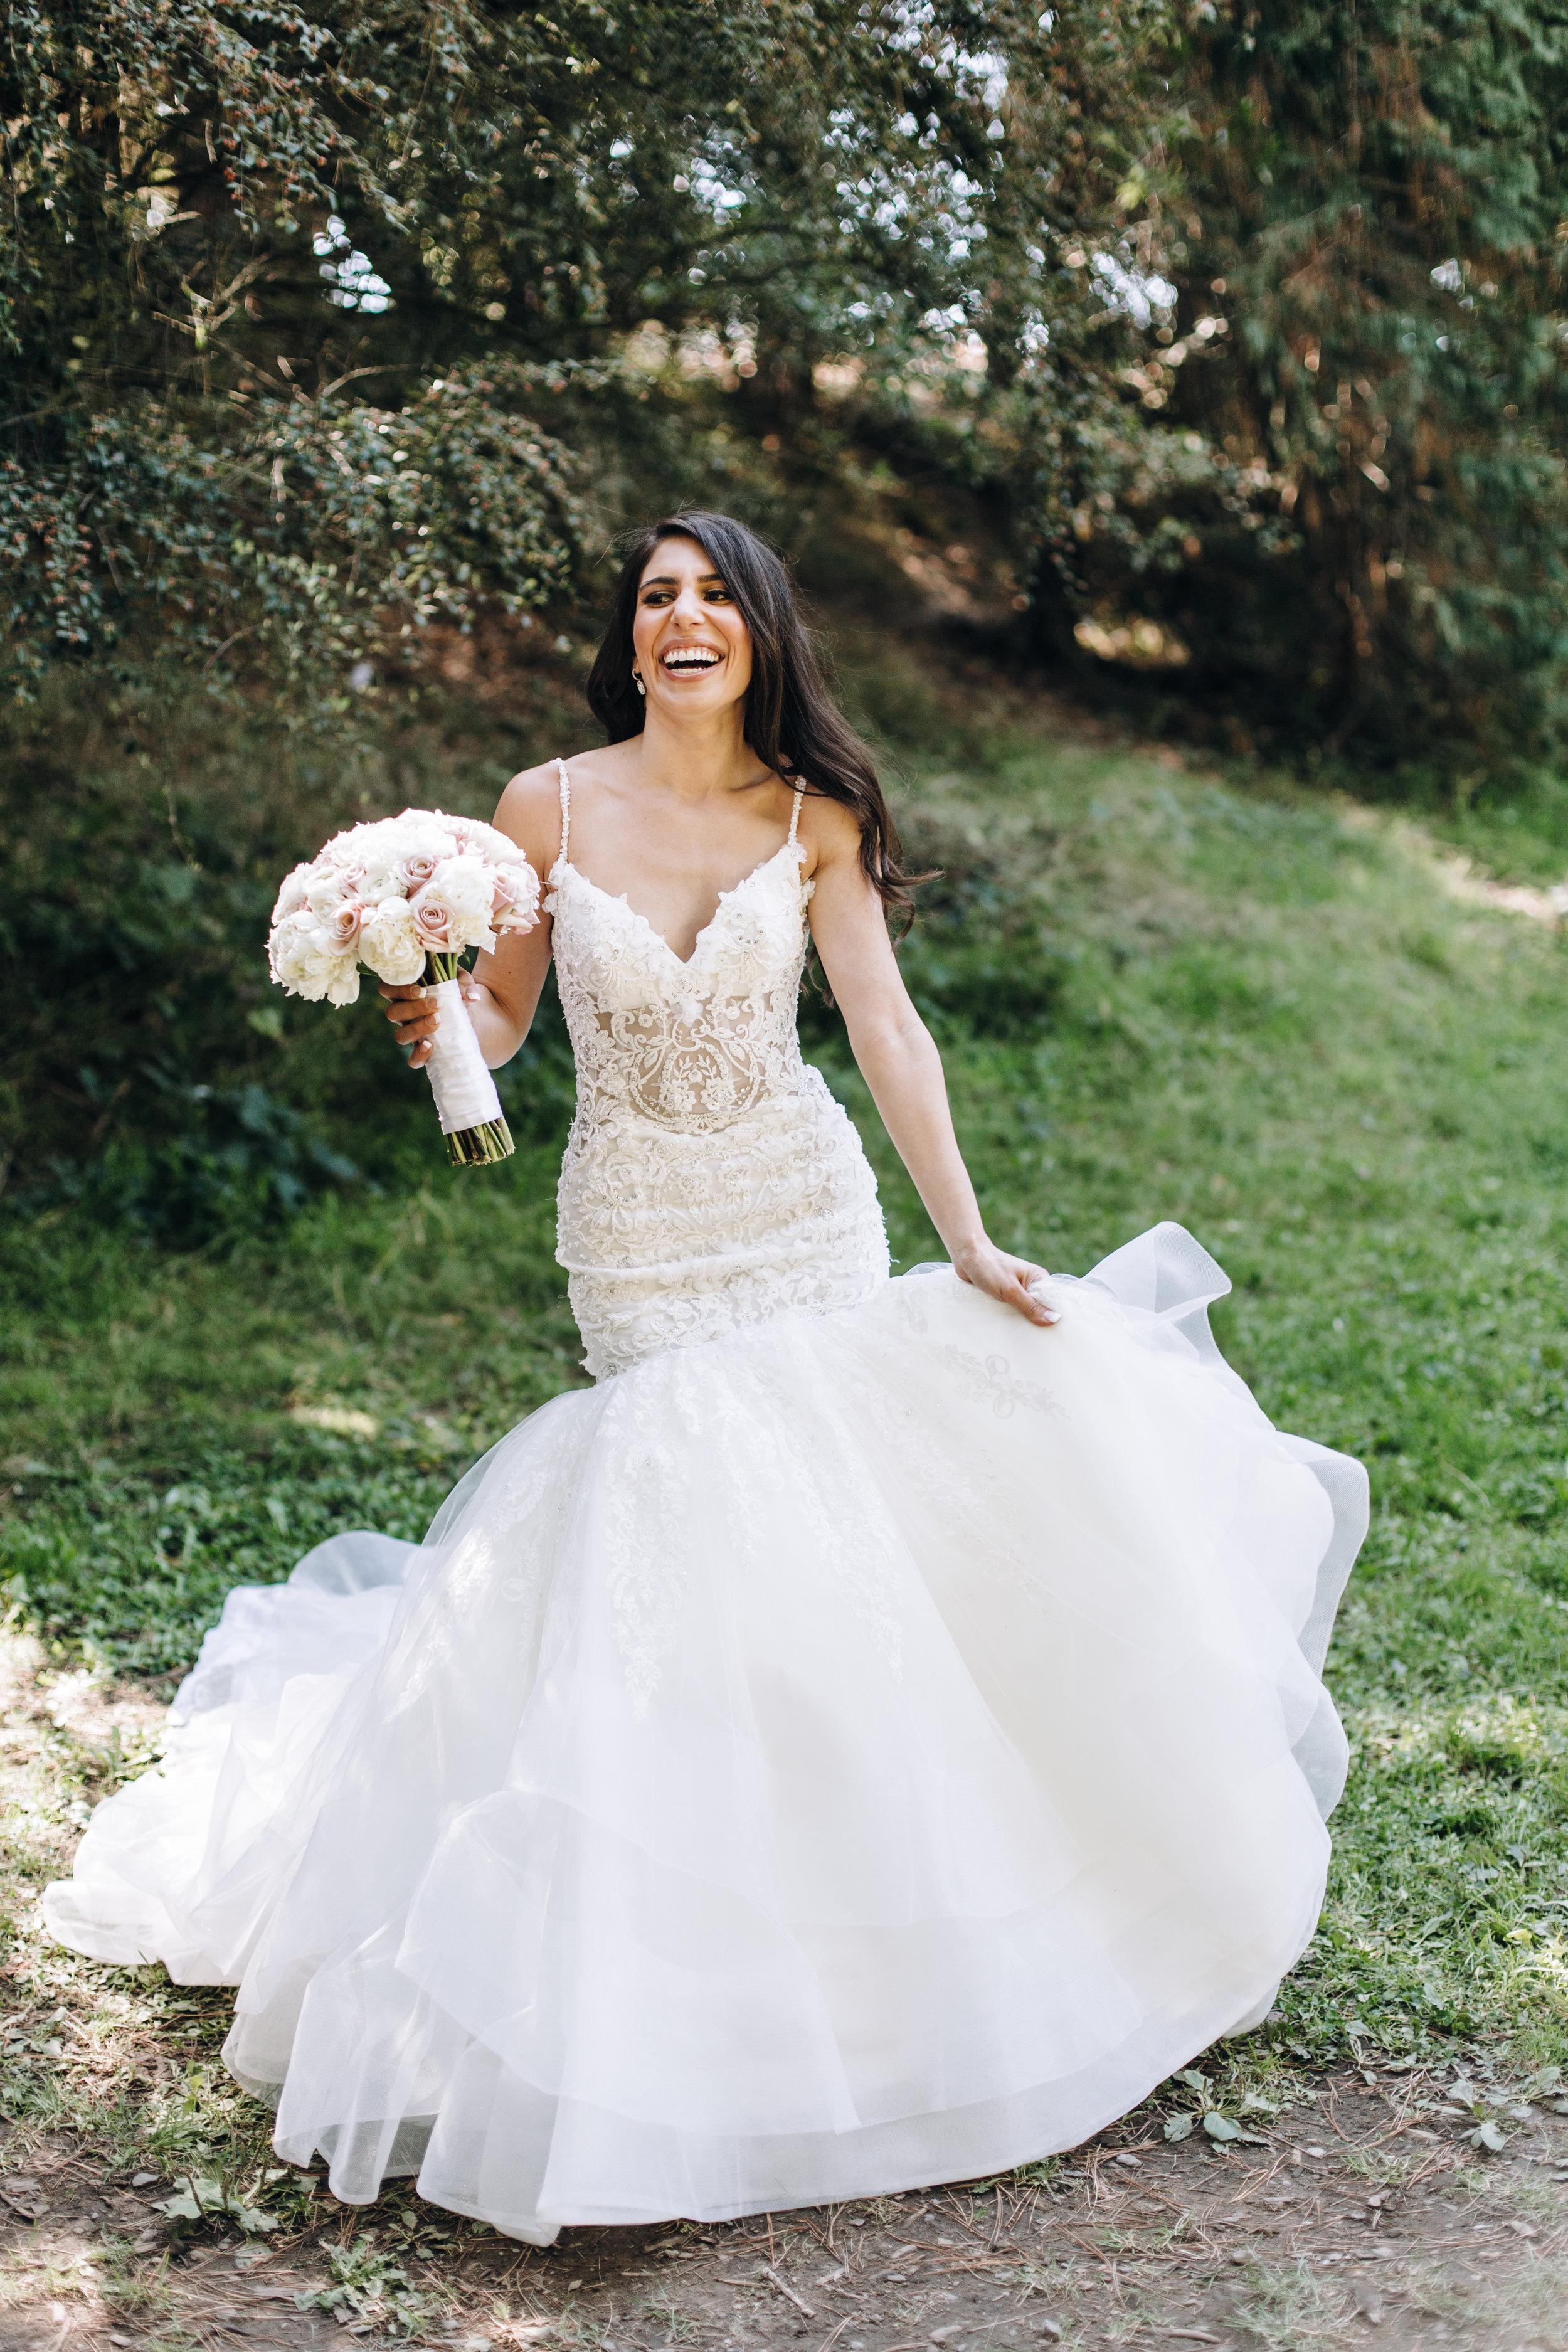 KaraNixonWeddings-GreekOrthodox-Oakland-Wedding-22.jpg